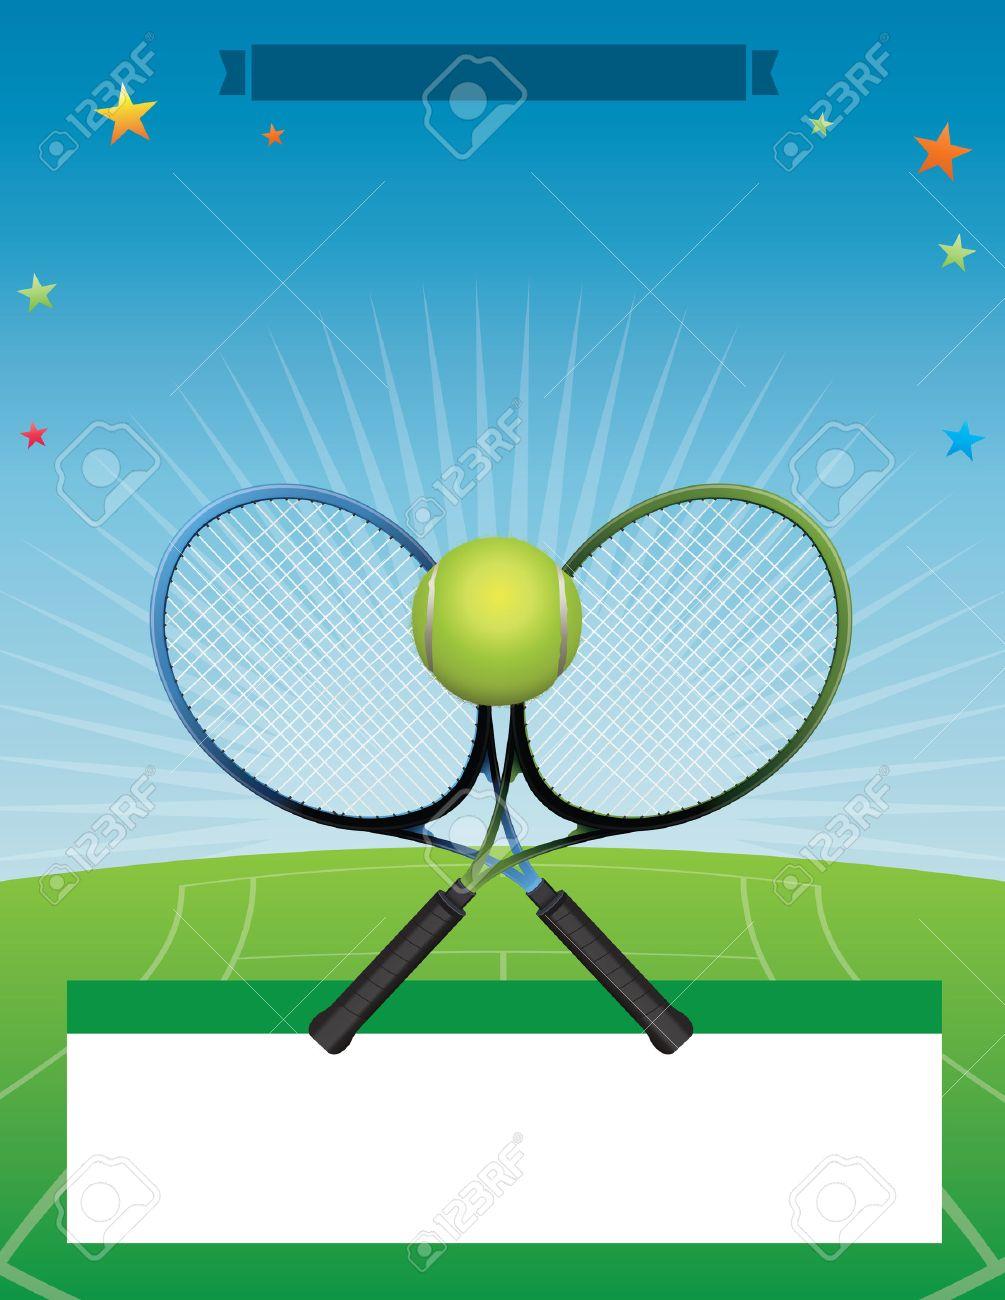 A tennis tournament illustration. - 49867950